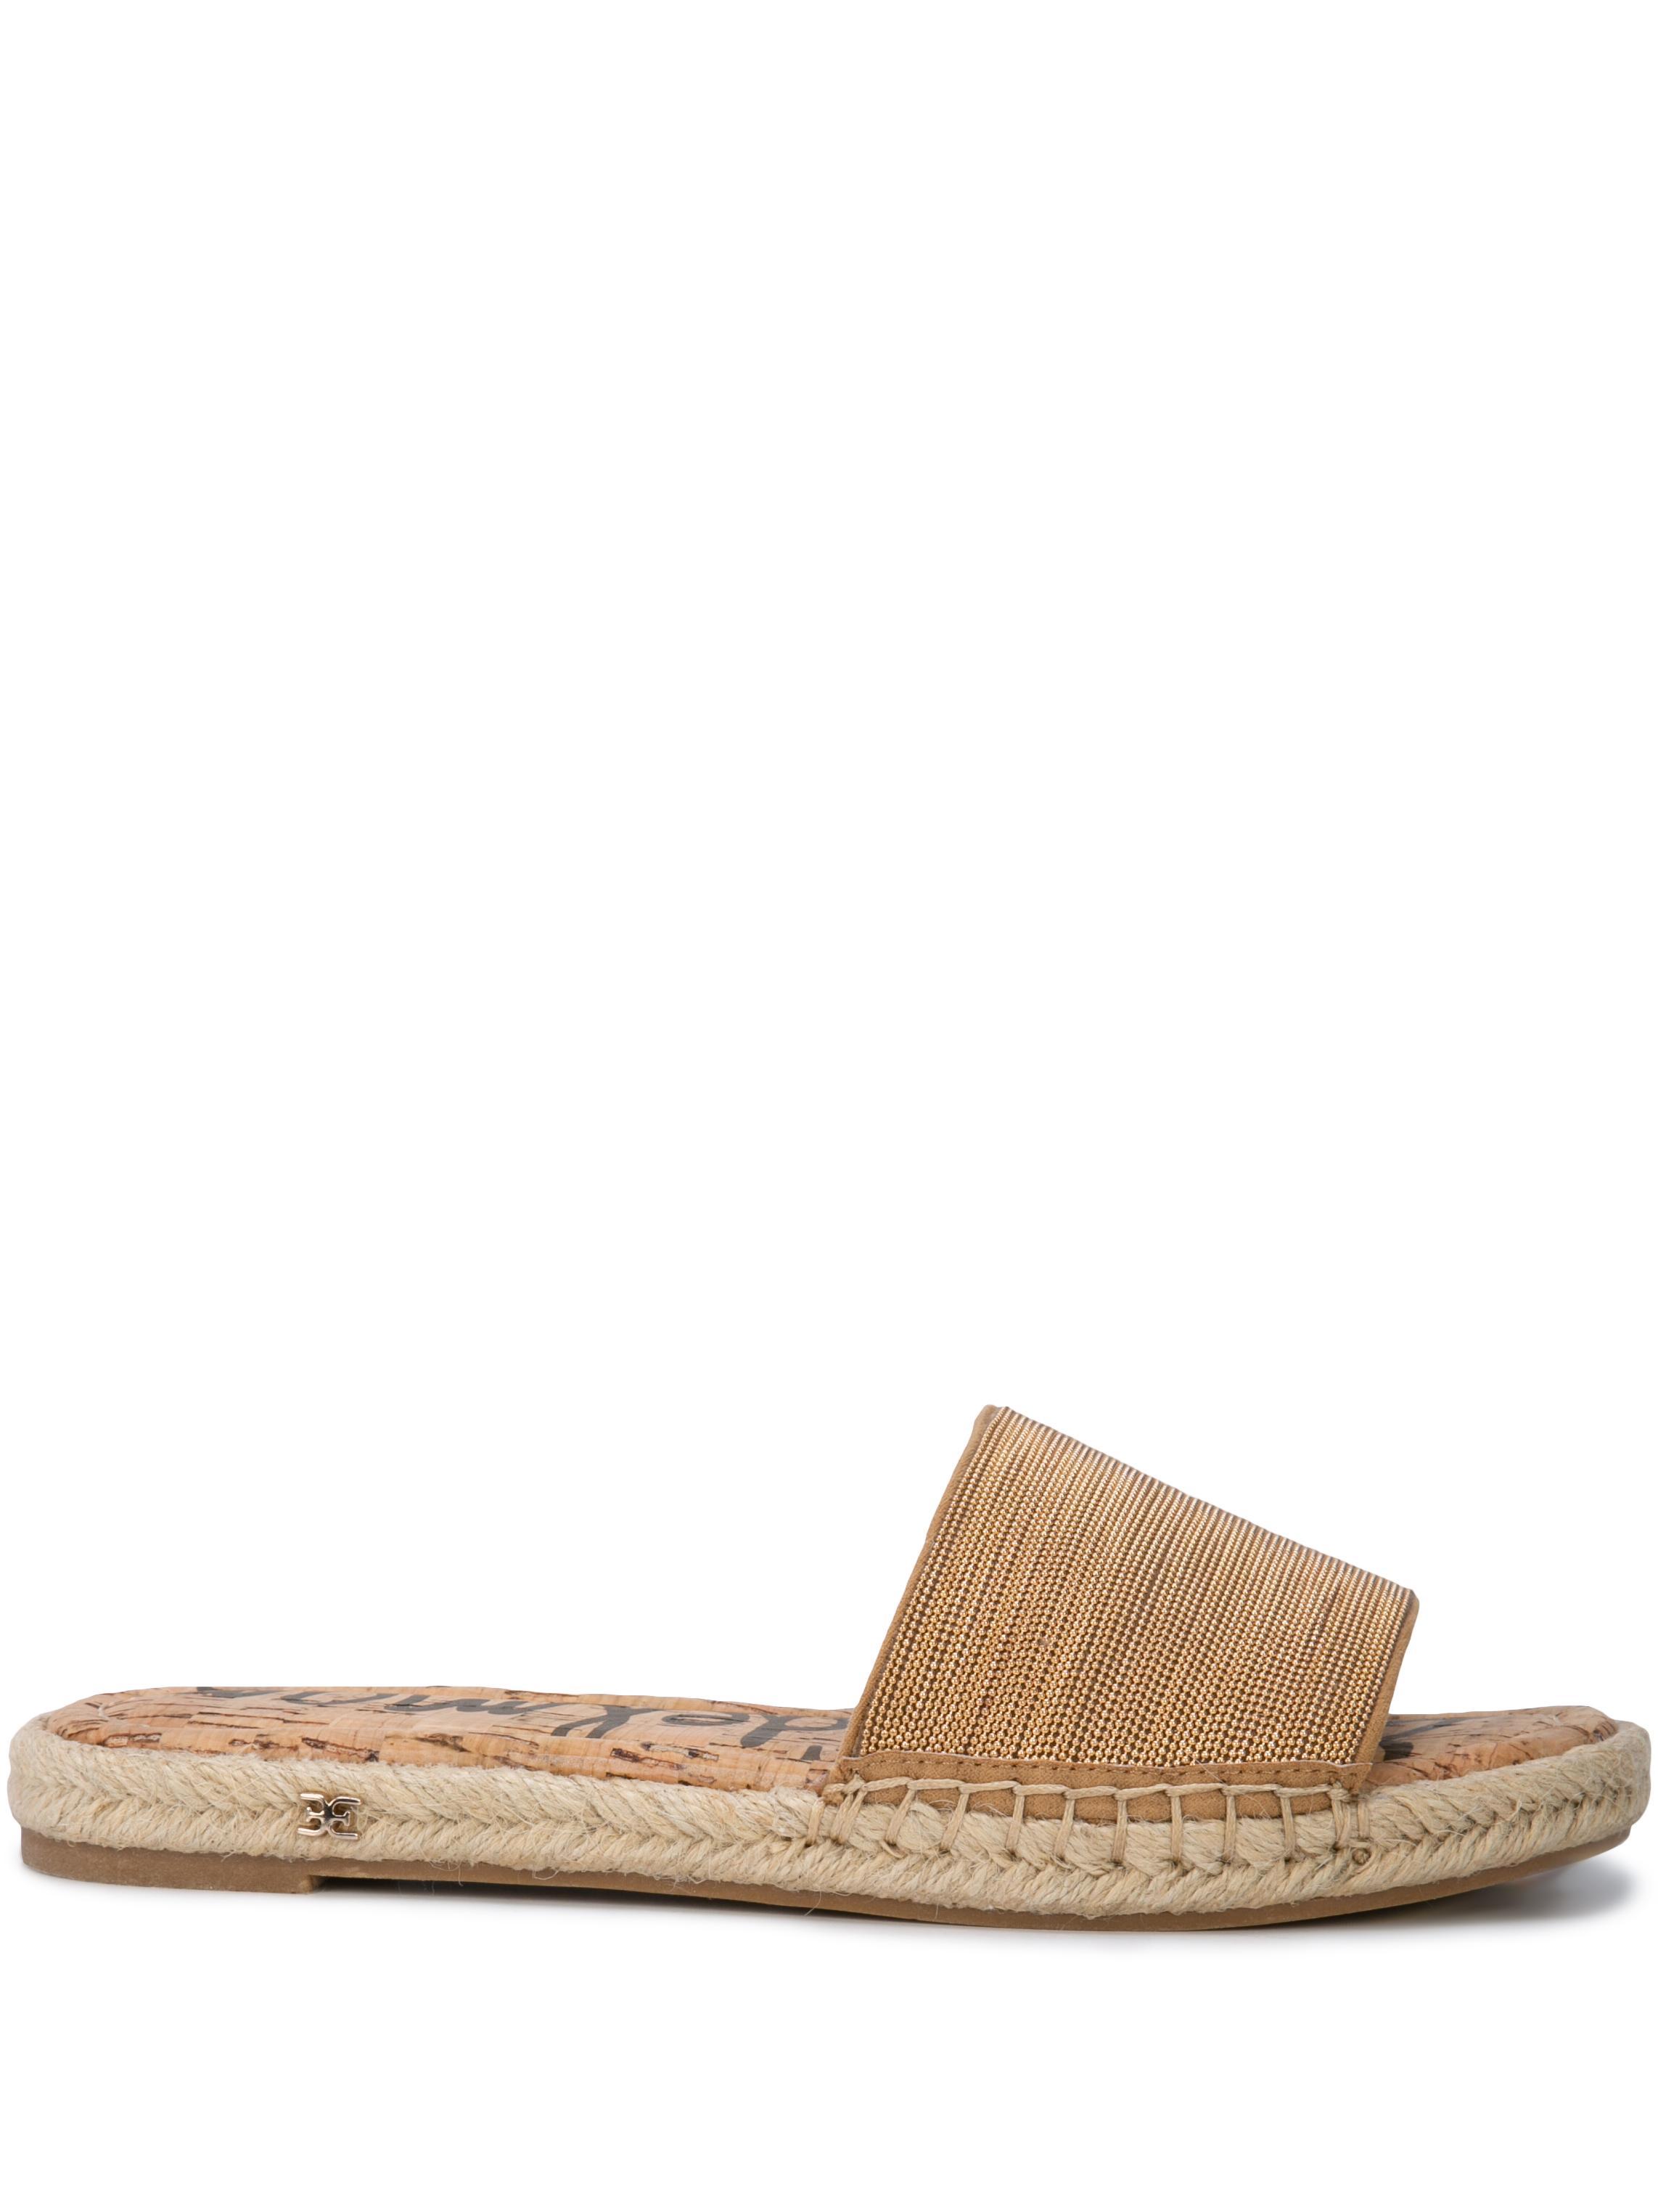 Suede/Metallic Flat Slide Sandal